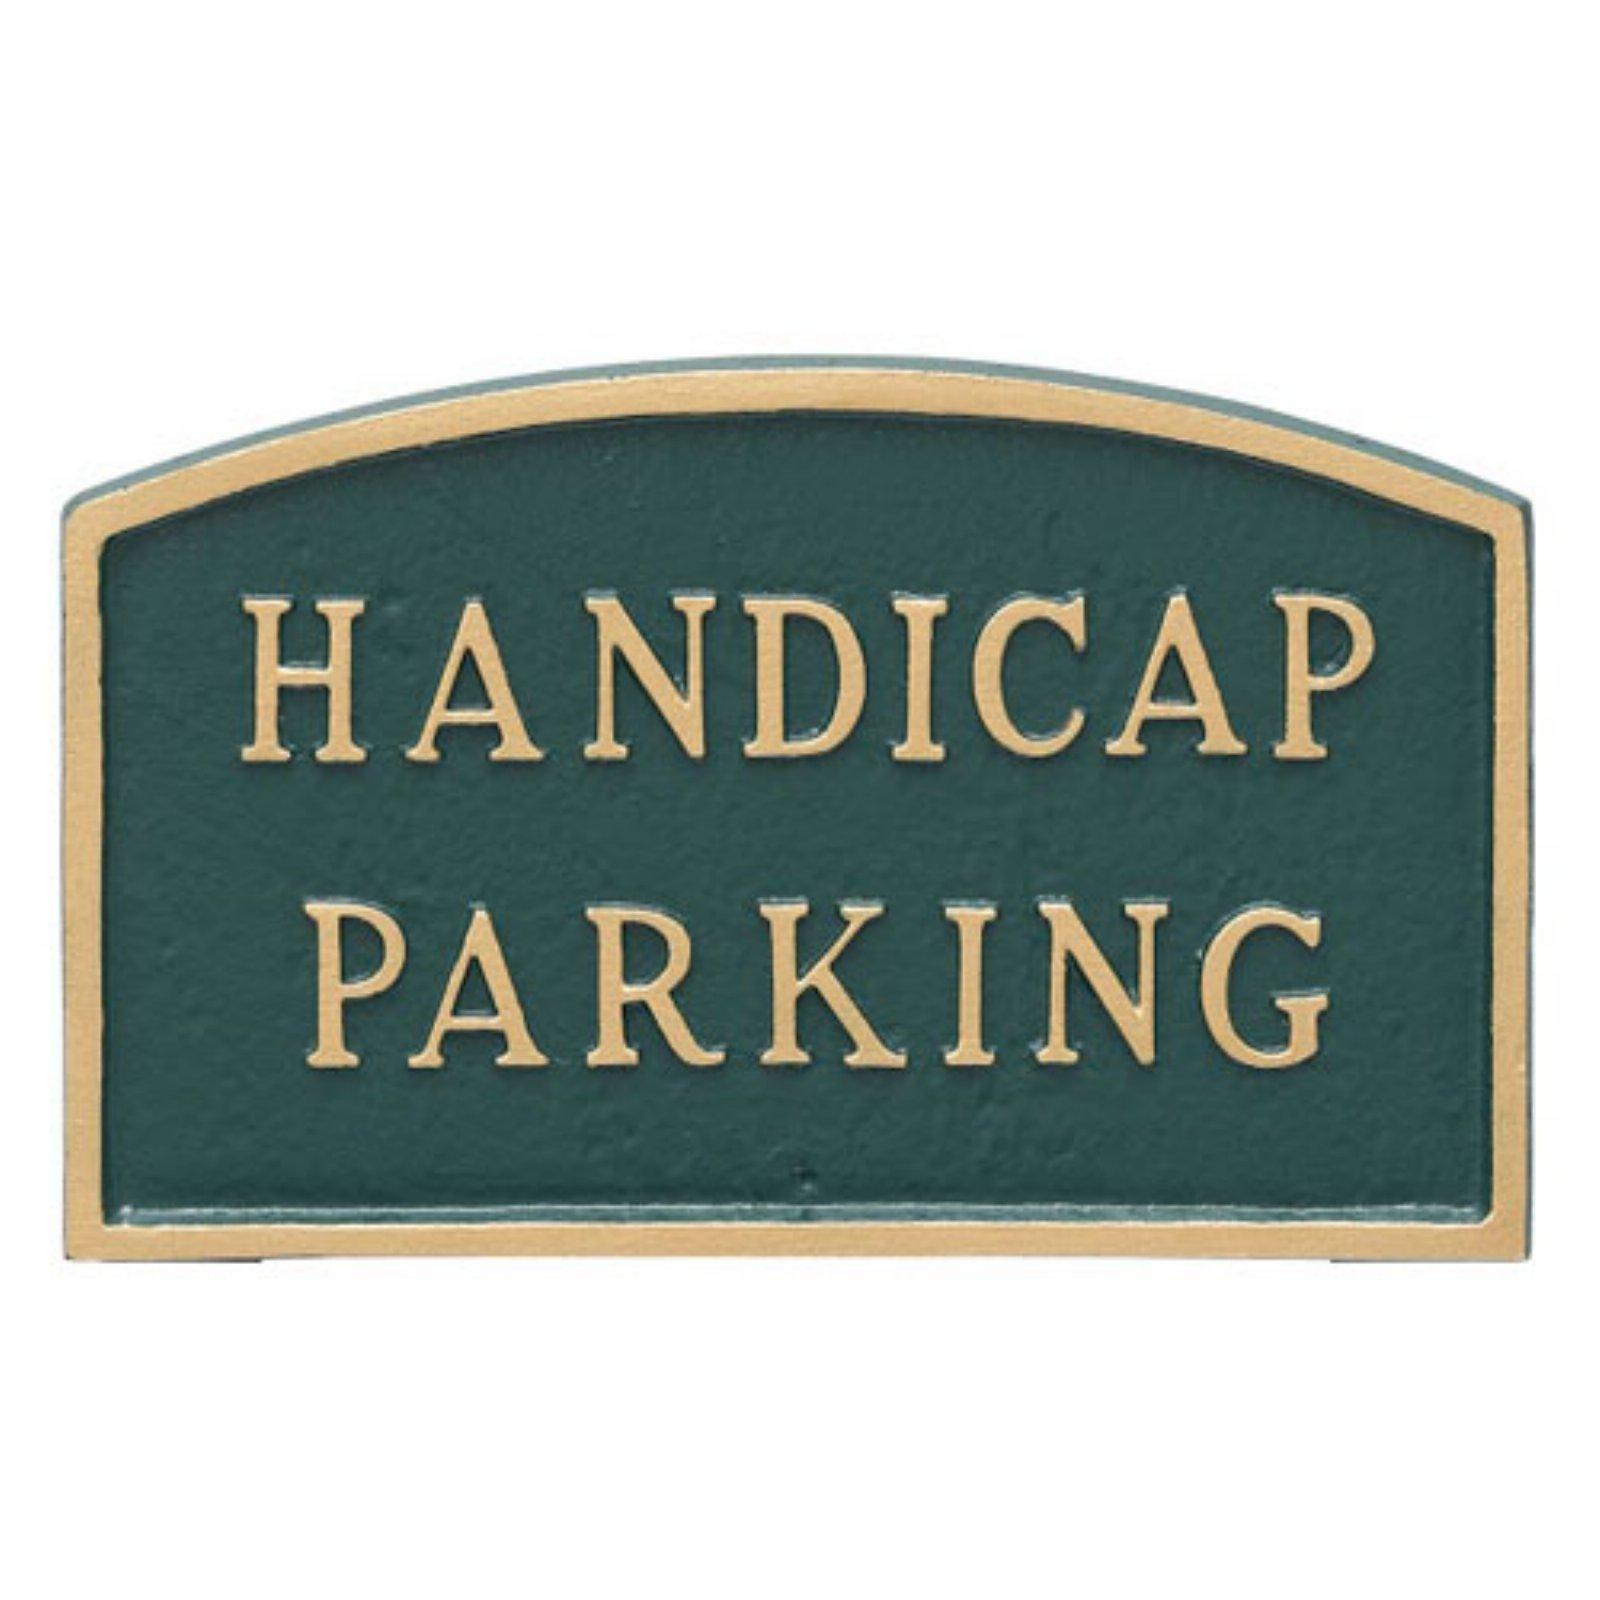 Montague Metal Products Handicap Parking Arched Wall Plaque